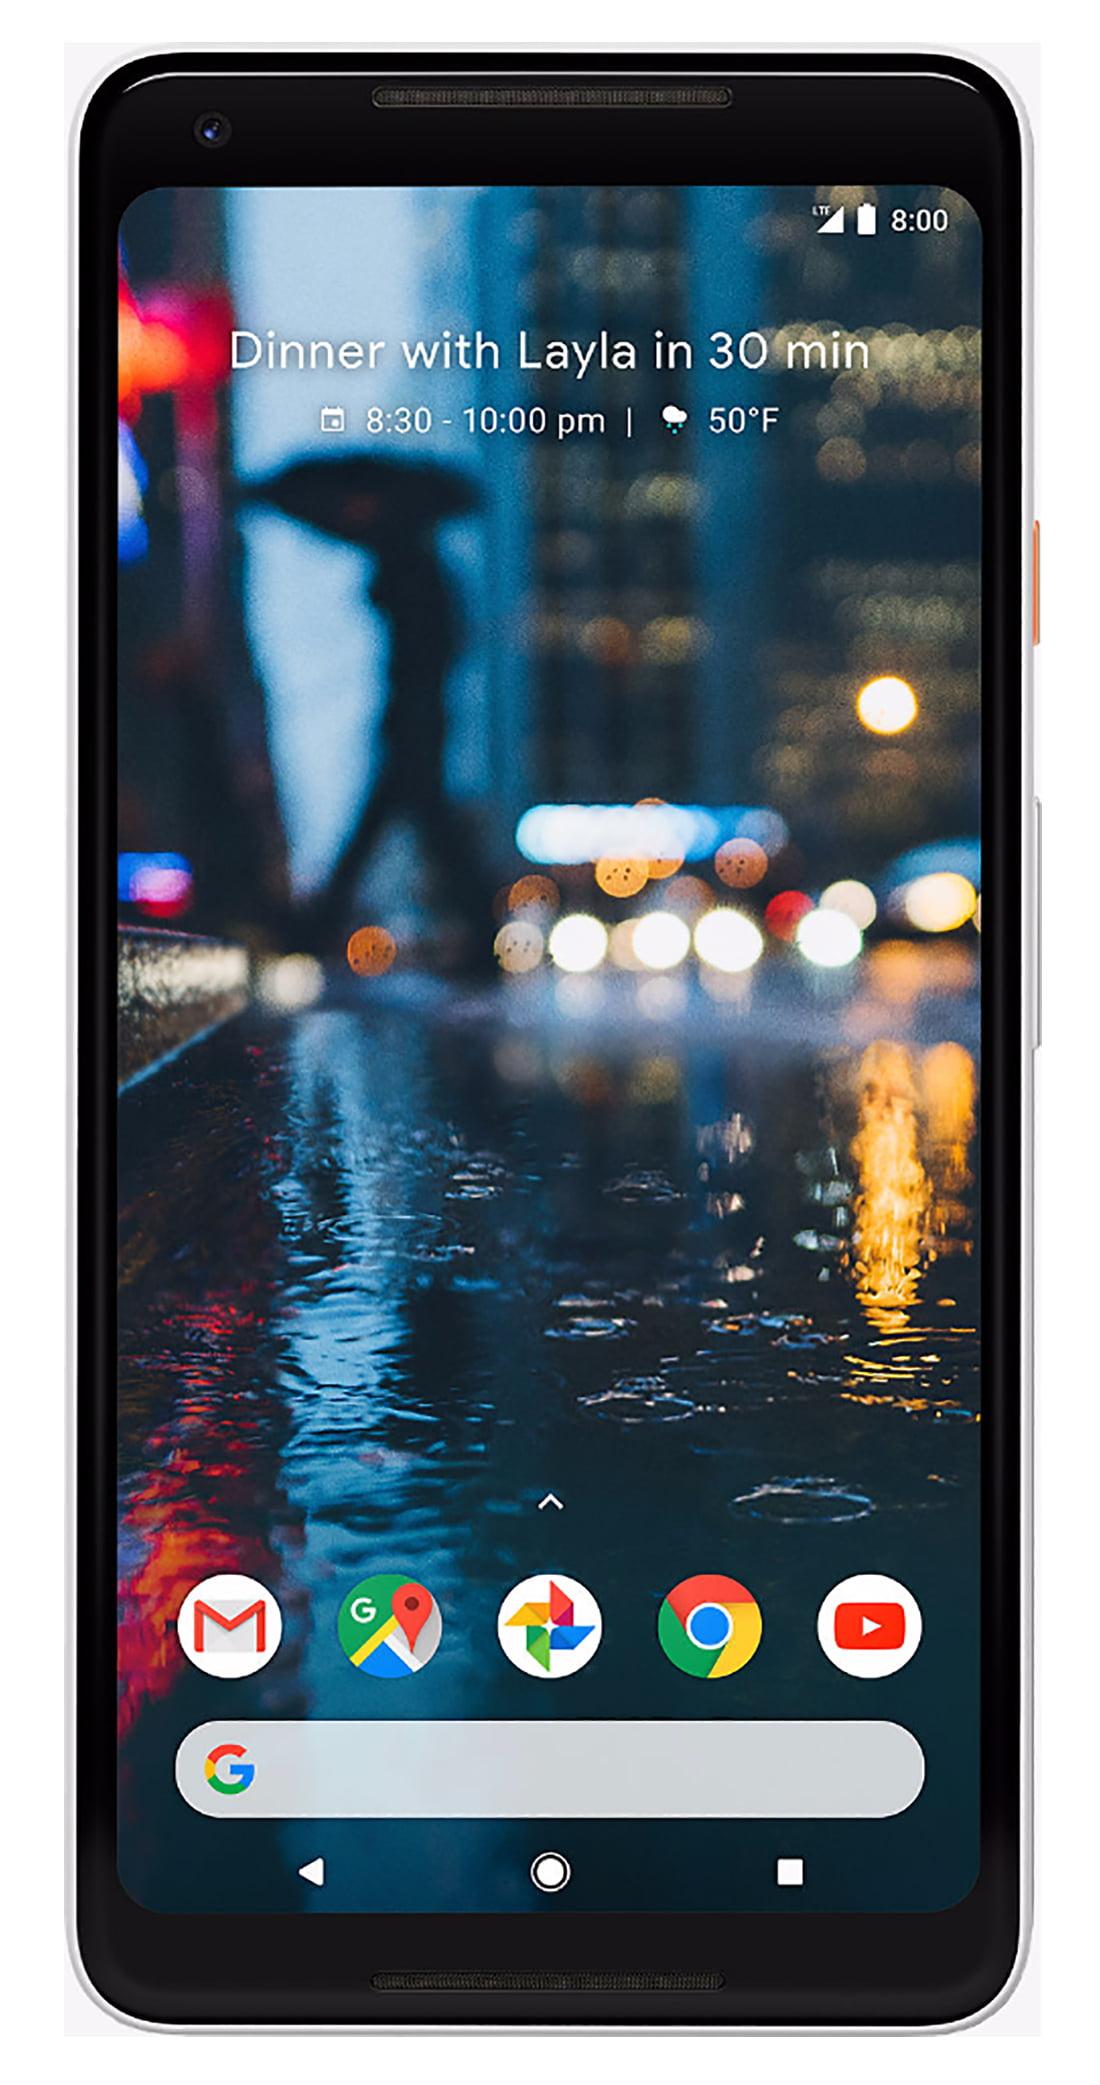 Google Pixel 2 XL 128GB Unlocked GSM/CDMA 4G LTE Octa-Core Phone w/...